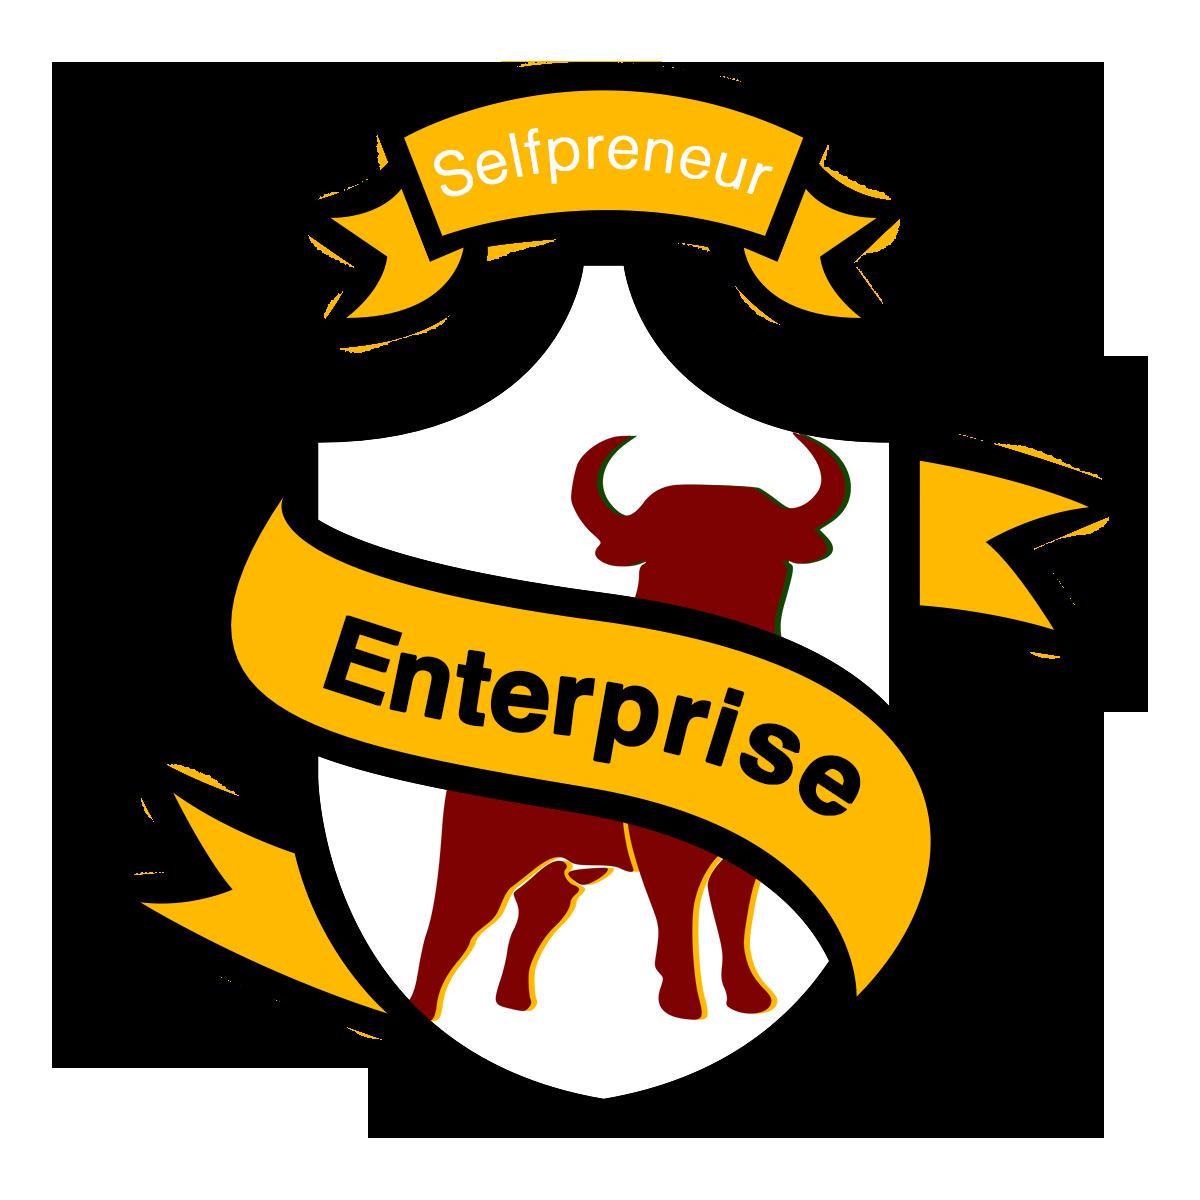 Selfpreneur for Enterprise Hiring